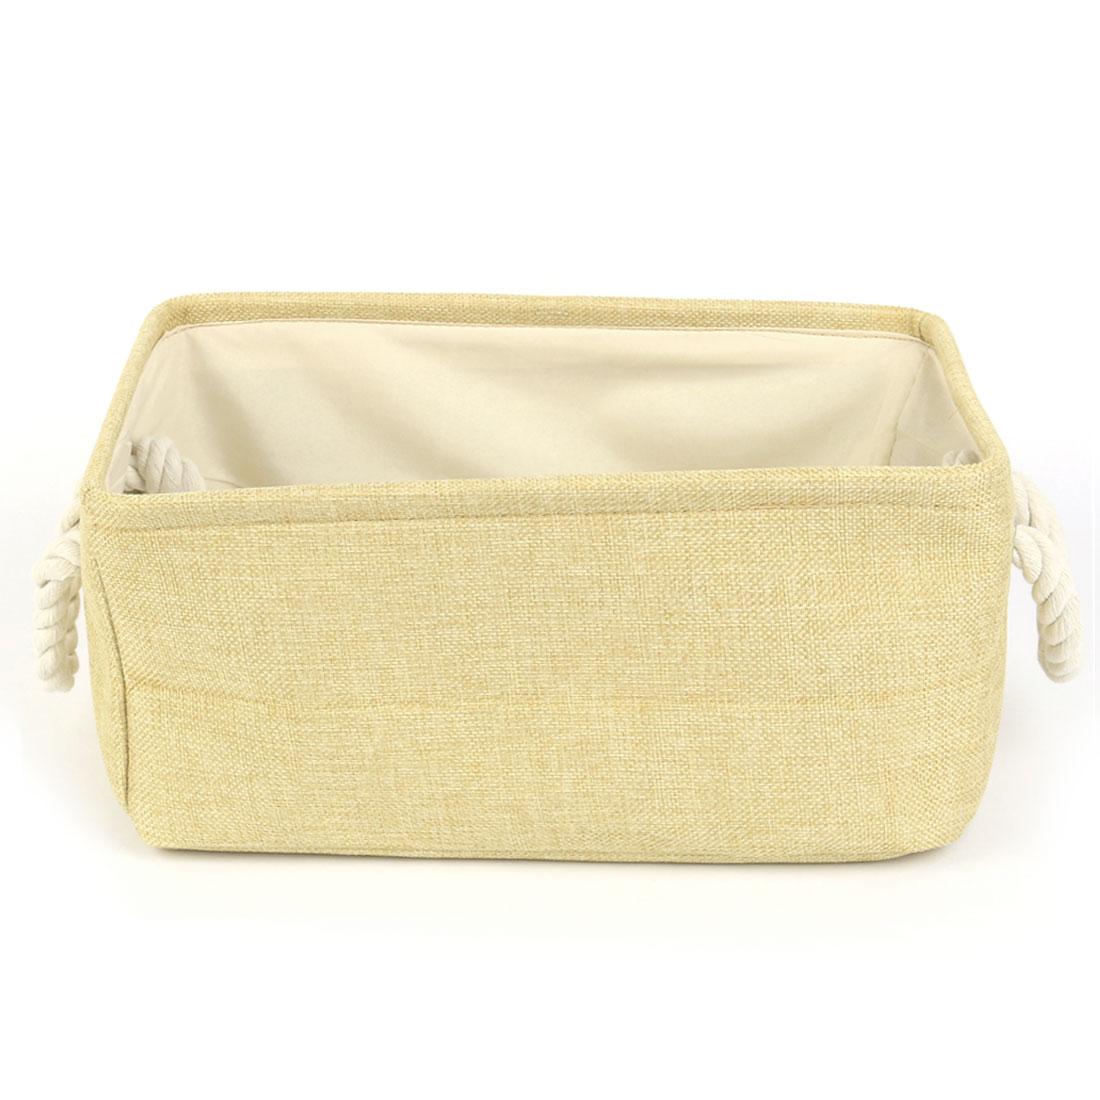 Collapsible Storage Basket Bin Toys Organizer Box Fabric Baskets Beige S Size